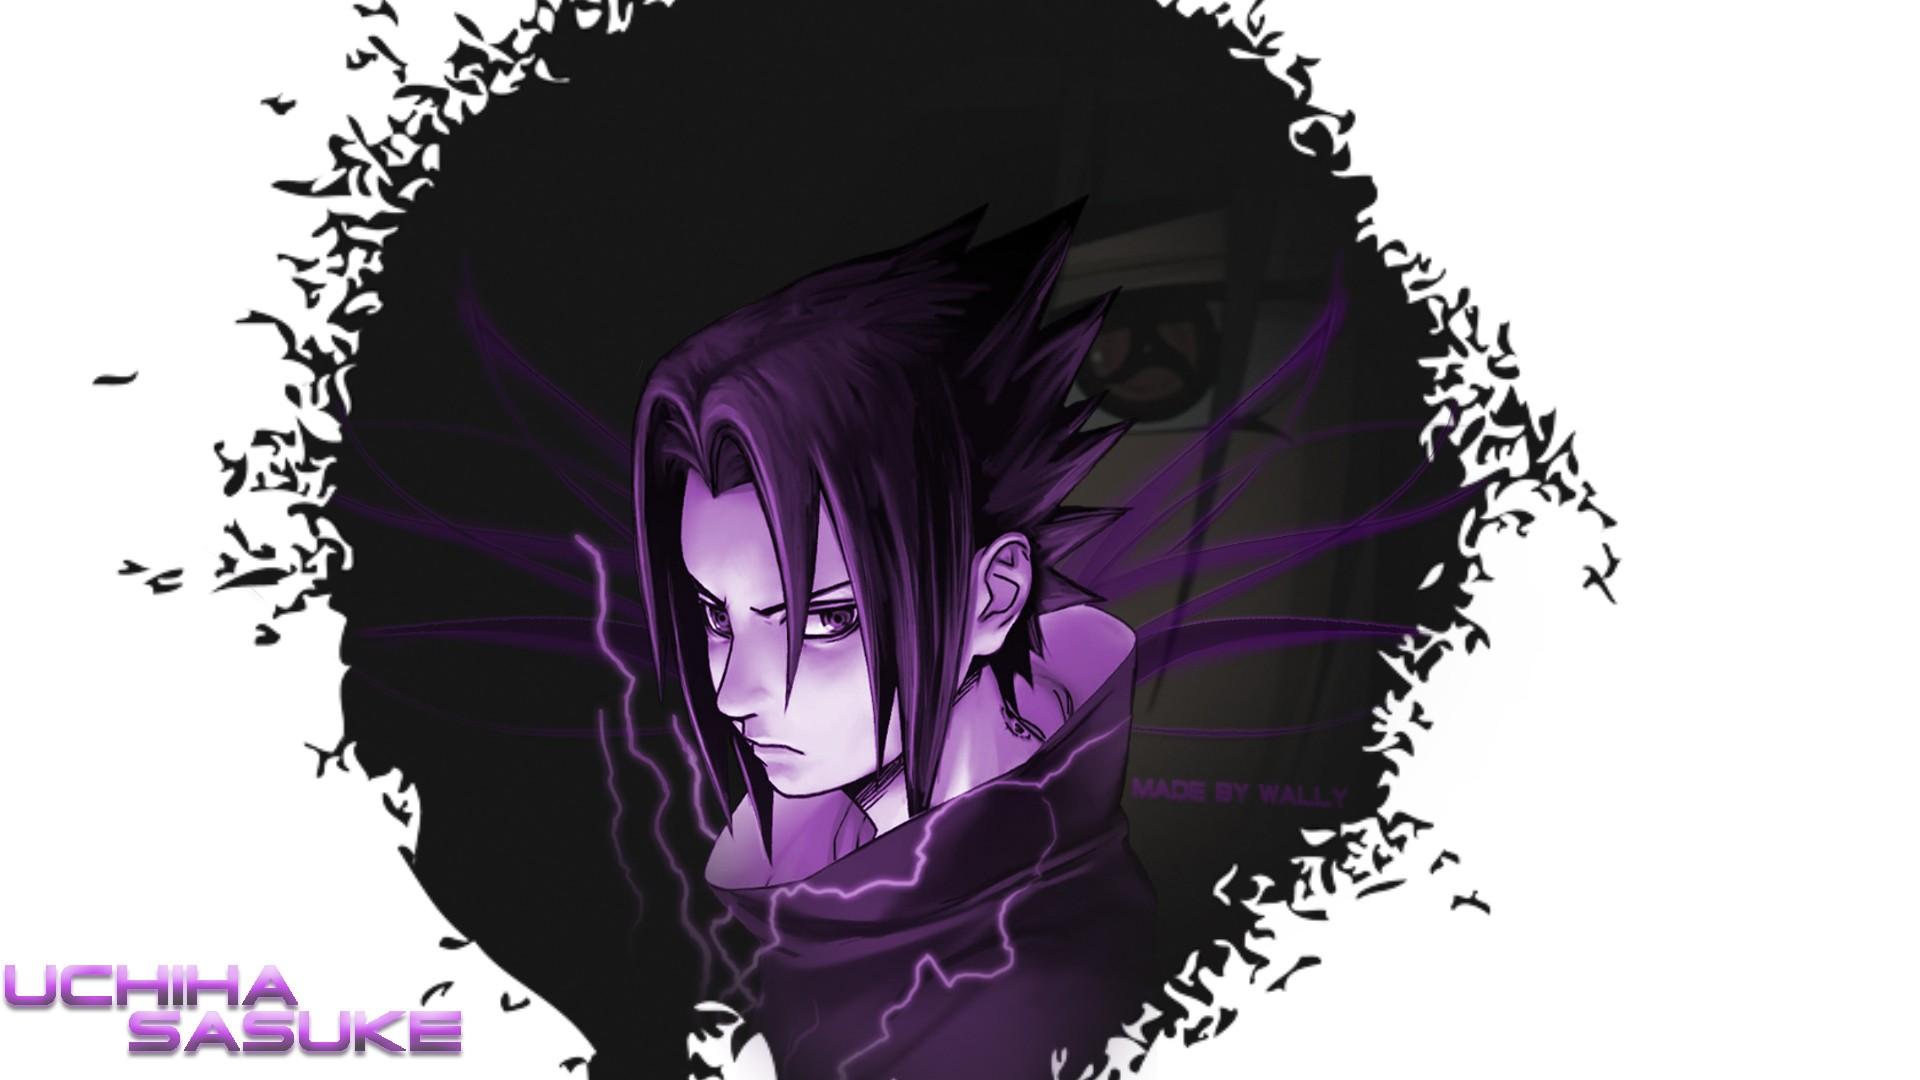 Sasuke Curse Mark - HD Wallpaper